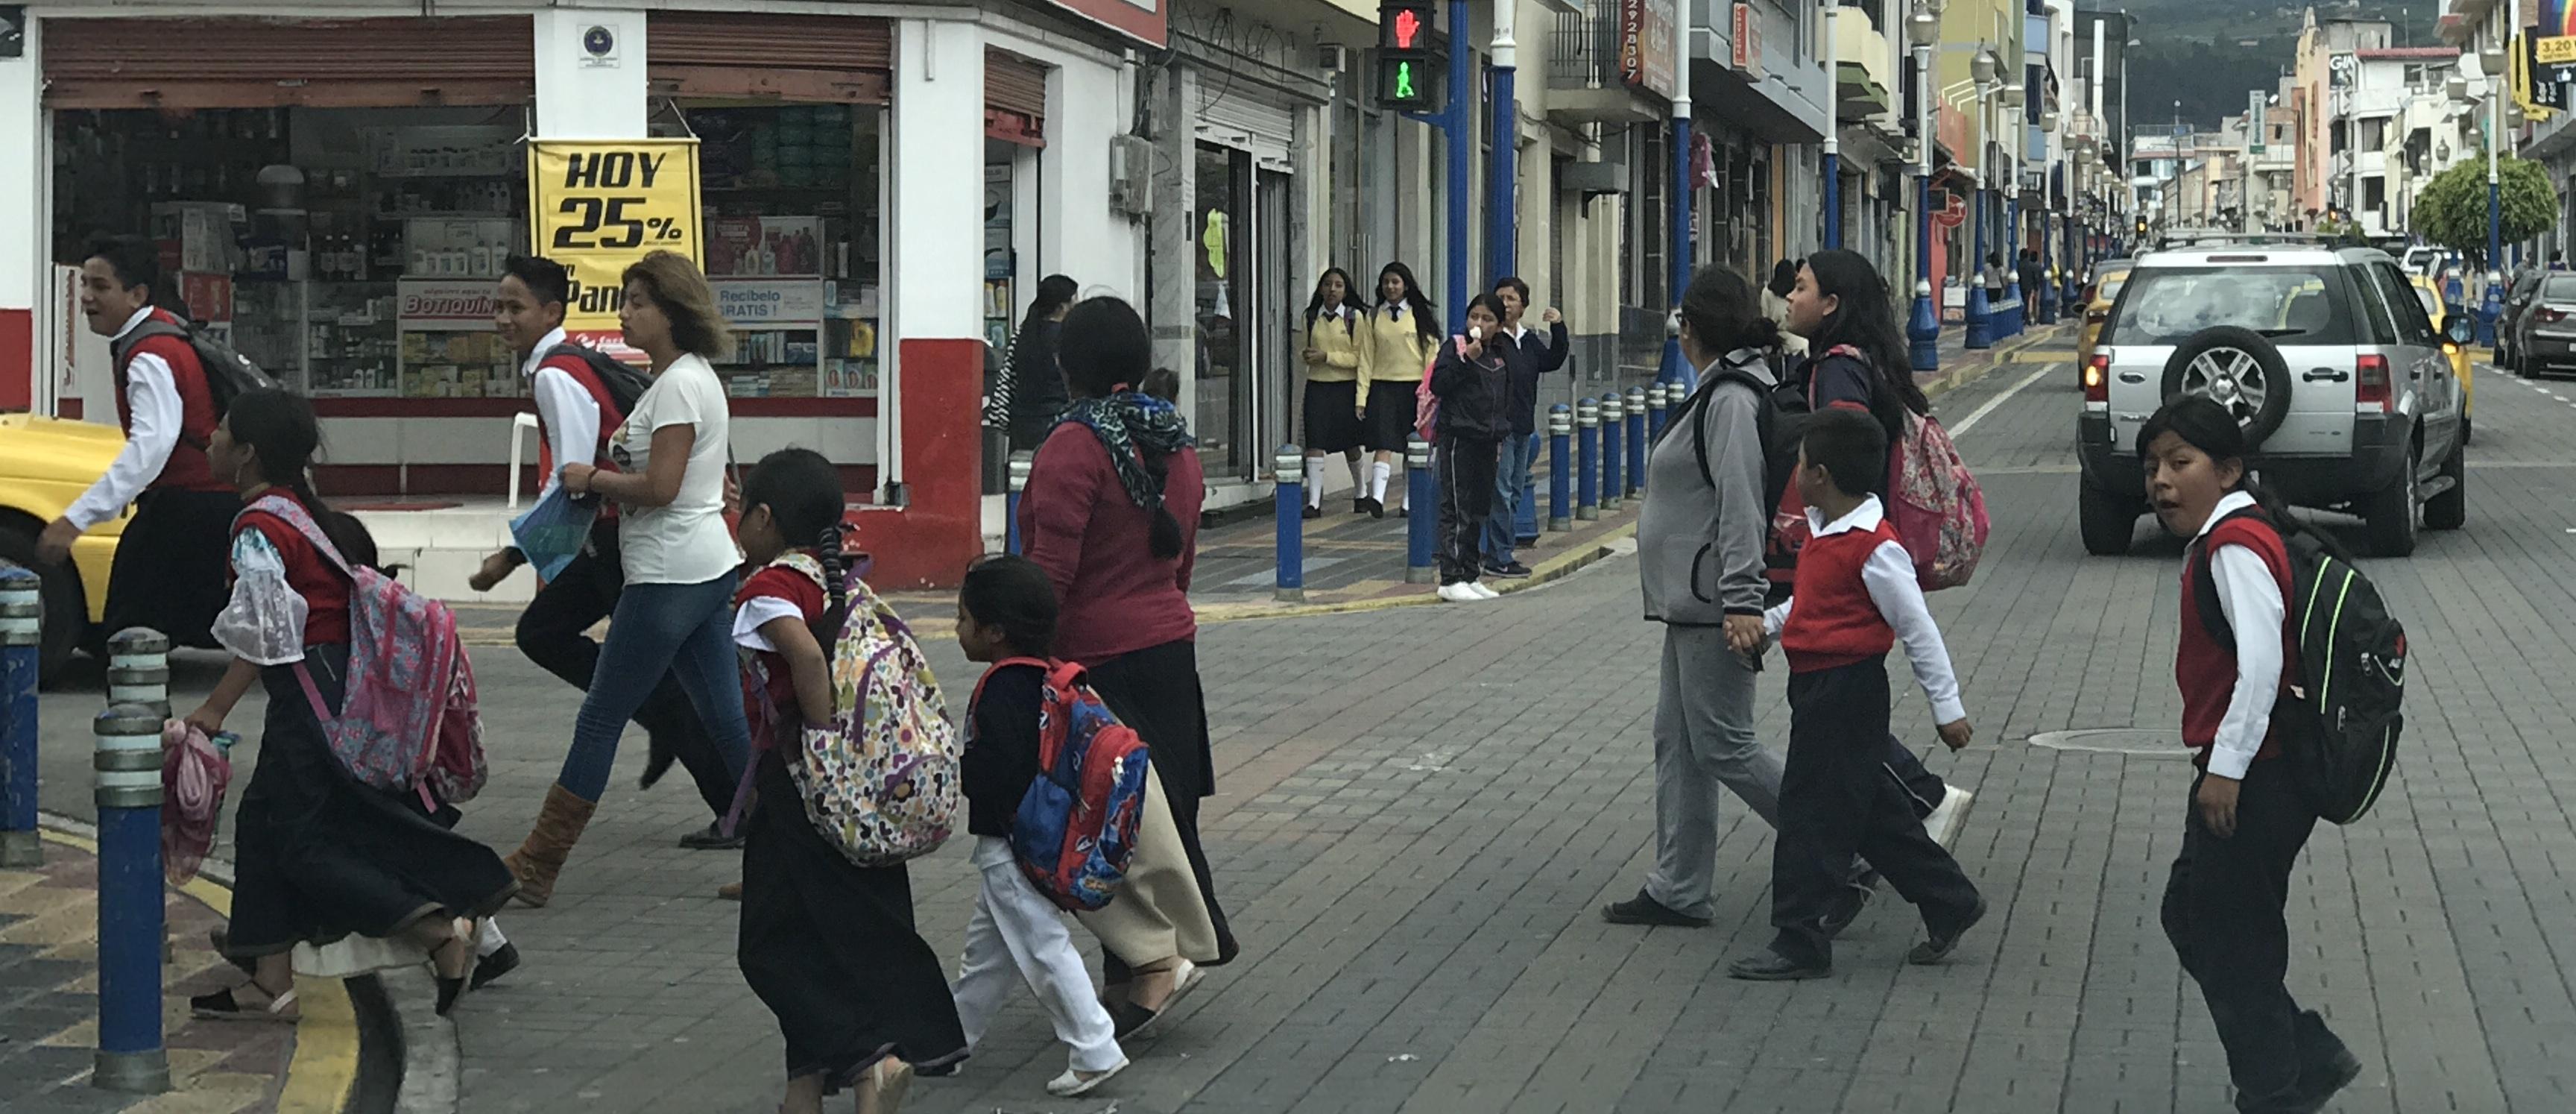 streetscene culture blend.JPG